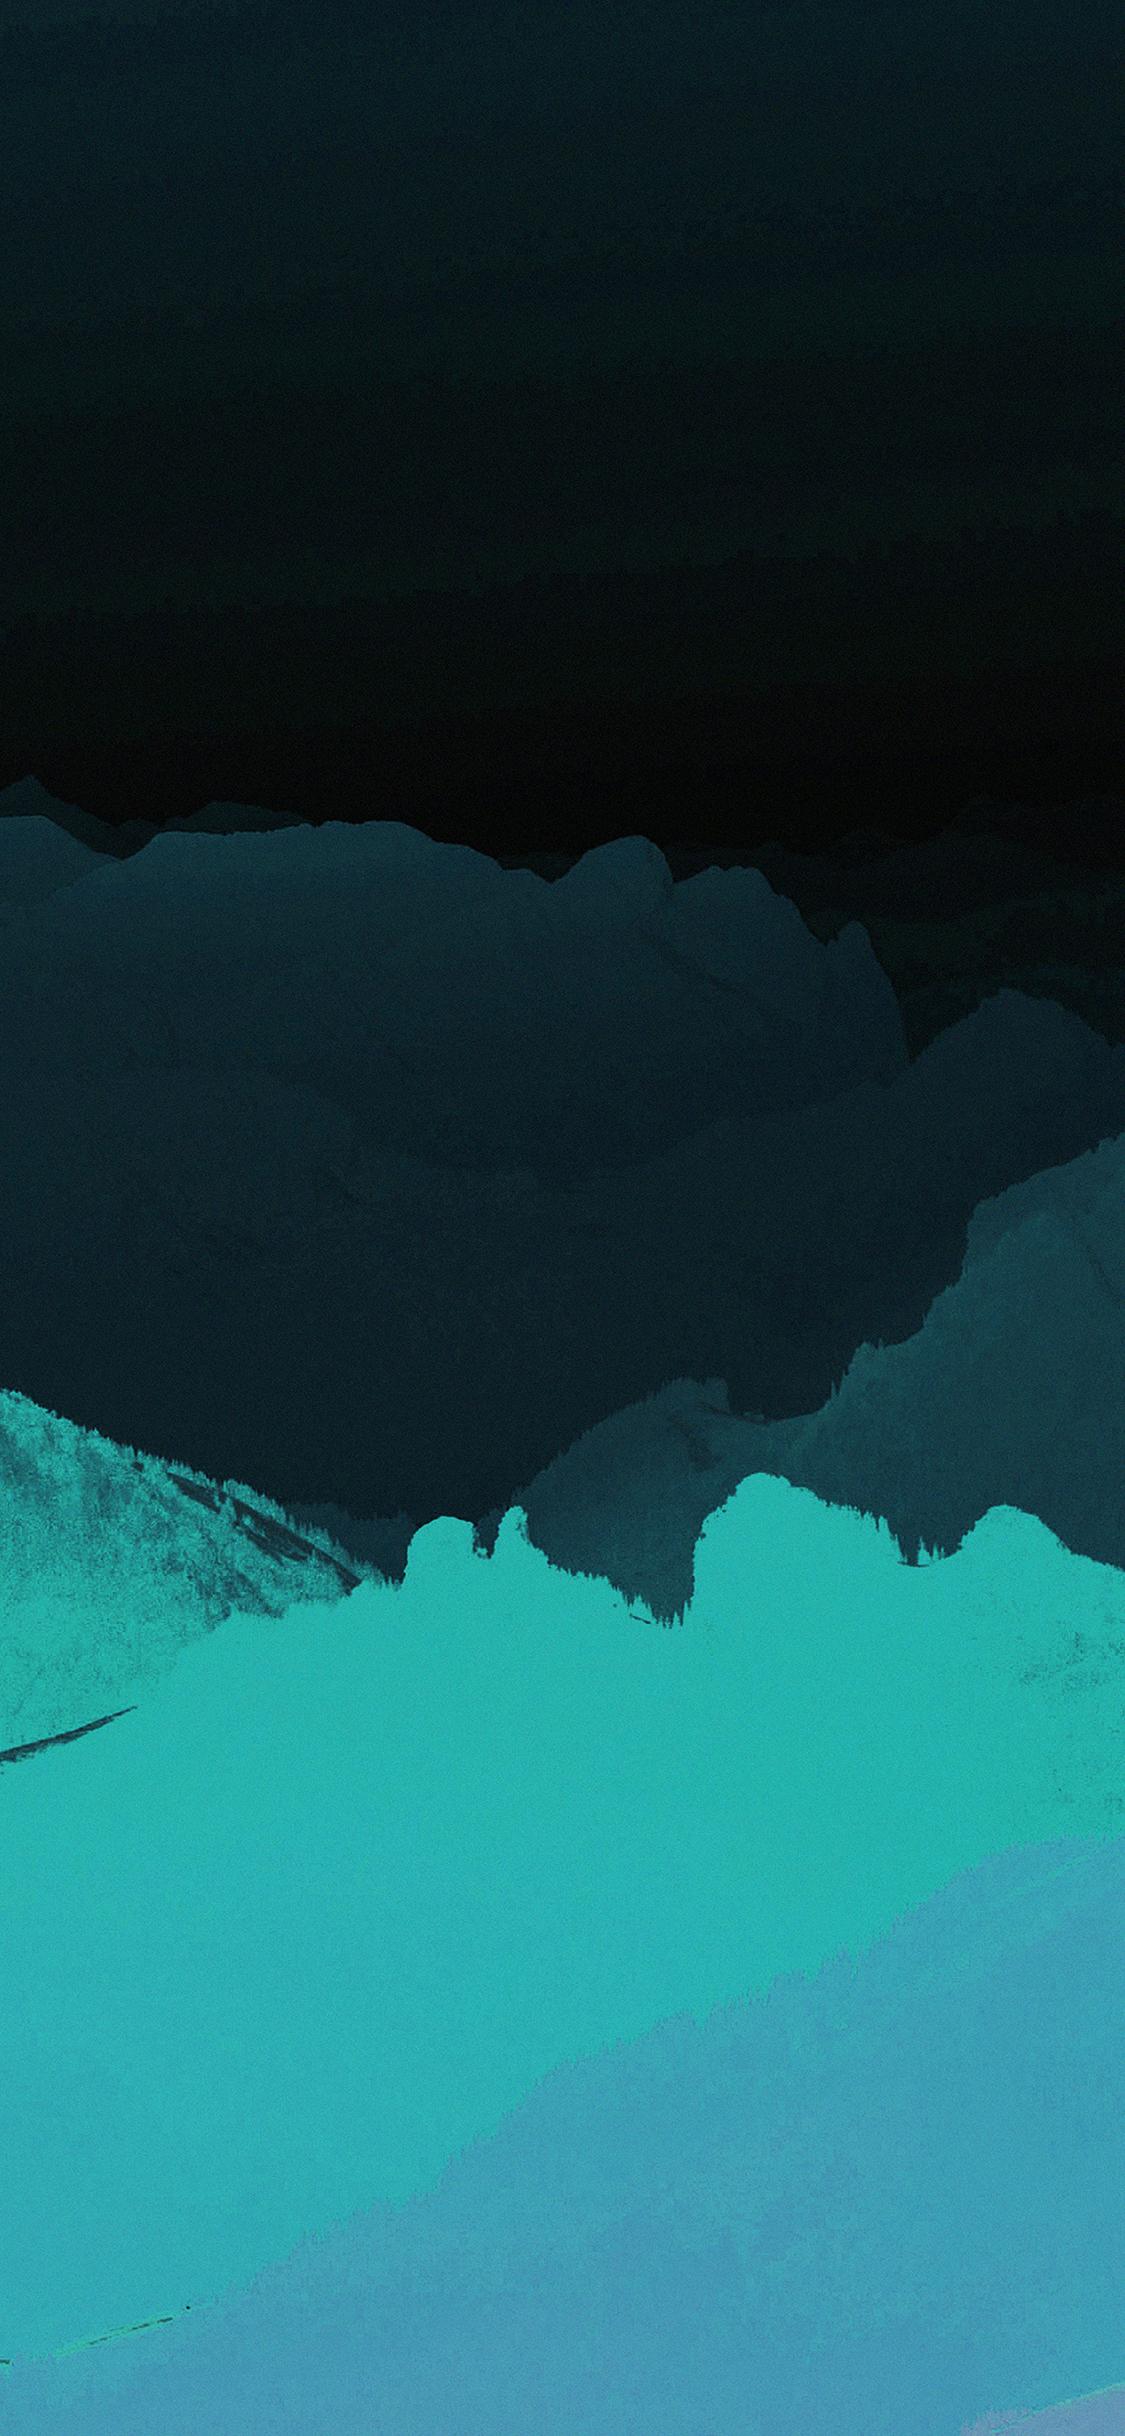 iPhoneXpapers.com-Apple-iPhone-wallpaper-mc79-wallpaper-dark-blue-mountains